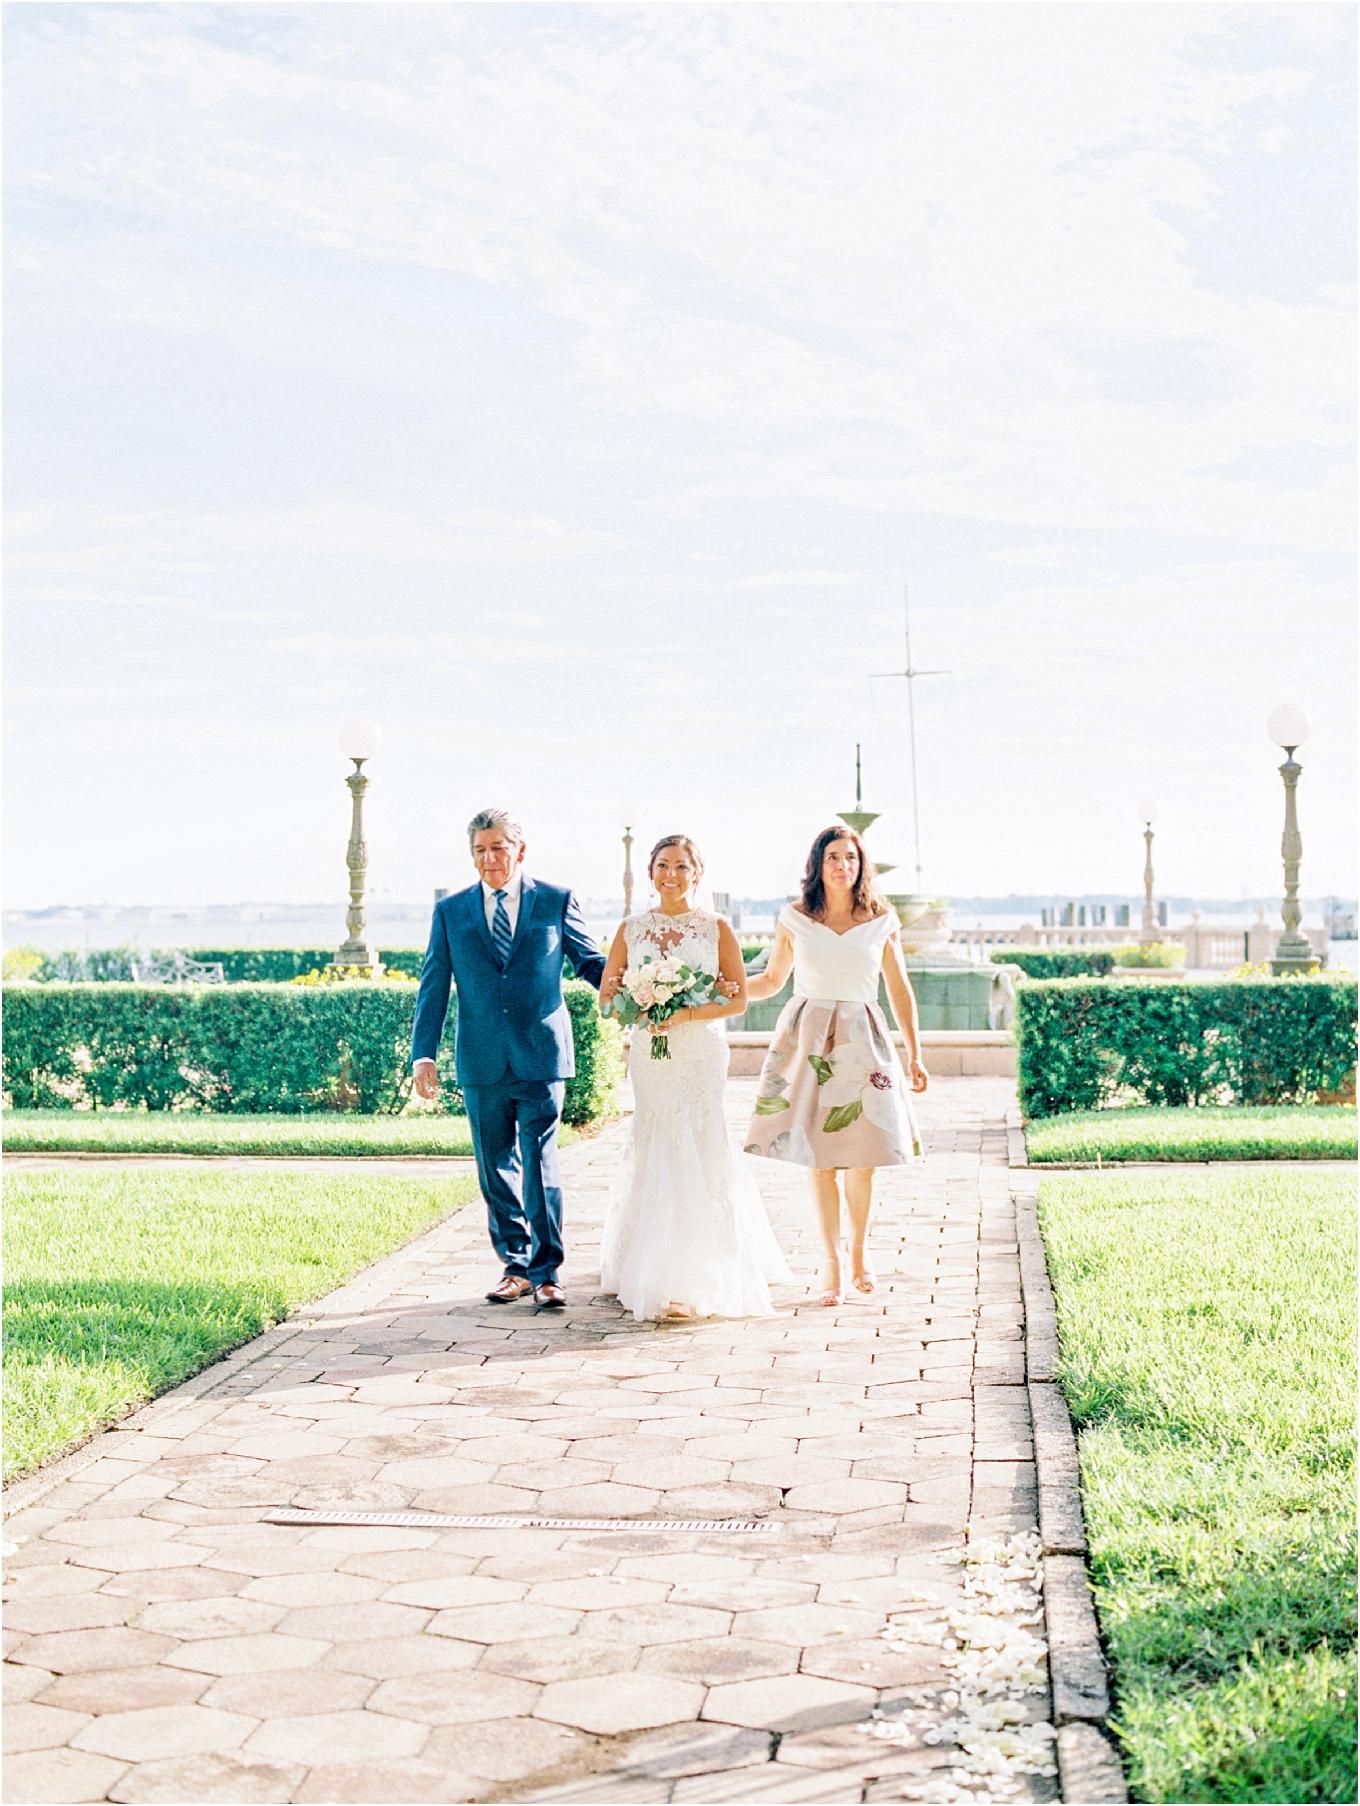 Lisa Silva Photography- Ponte Vedra Beach, St. Augustine and Jacksonville, Florida Fine Art Film Wedding and Boudoir Photography- Elegant Blush  Wedding at Epping Forest Yacht Club in Jacksonville, Florida_0047.jpg